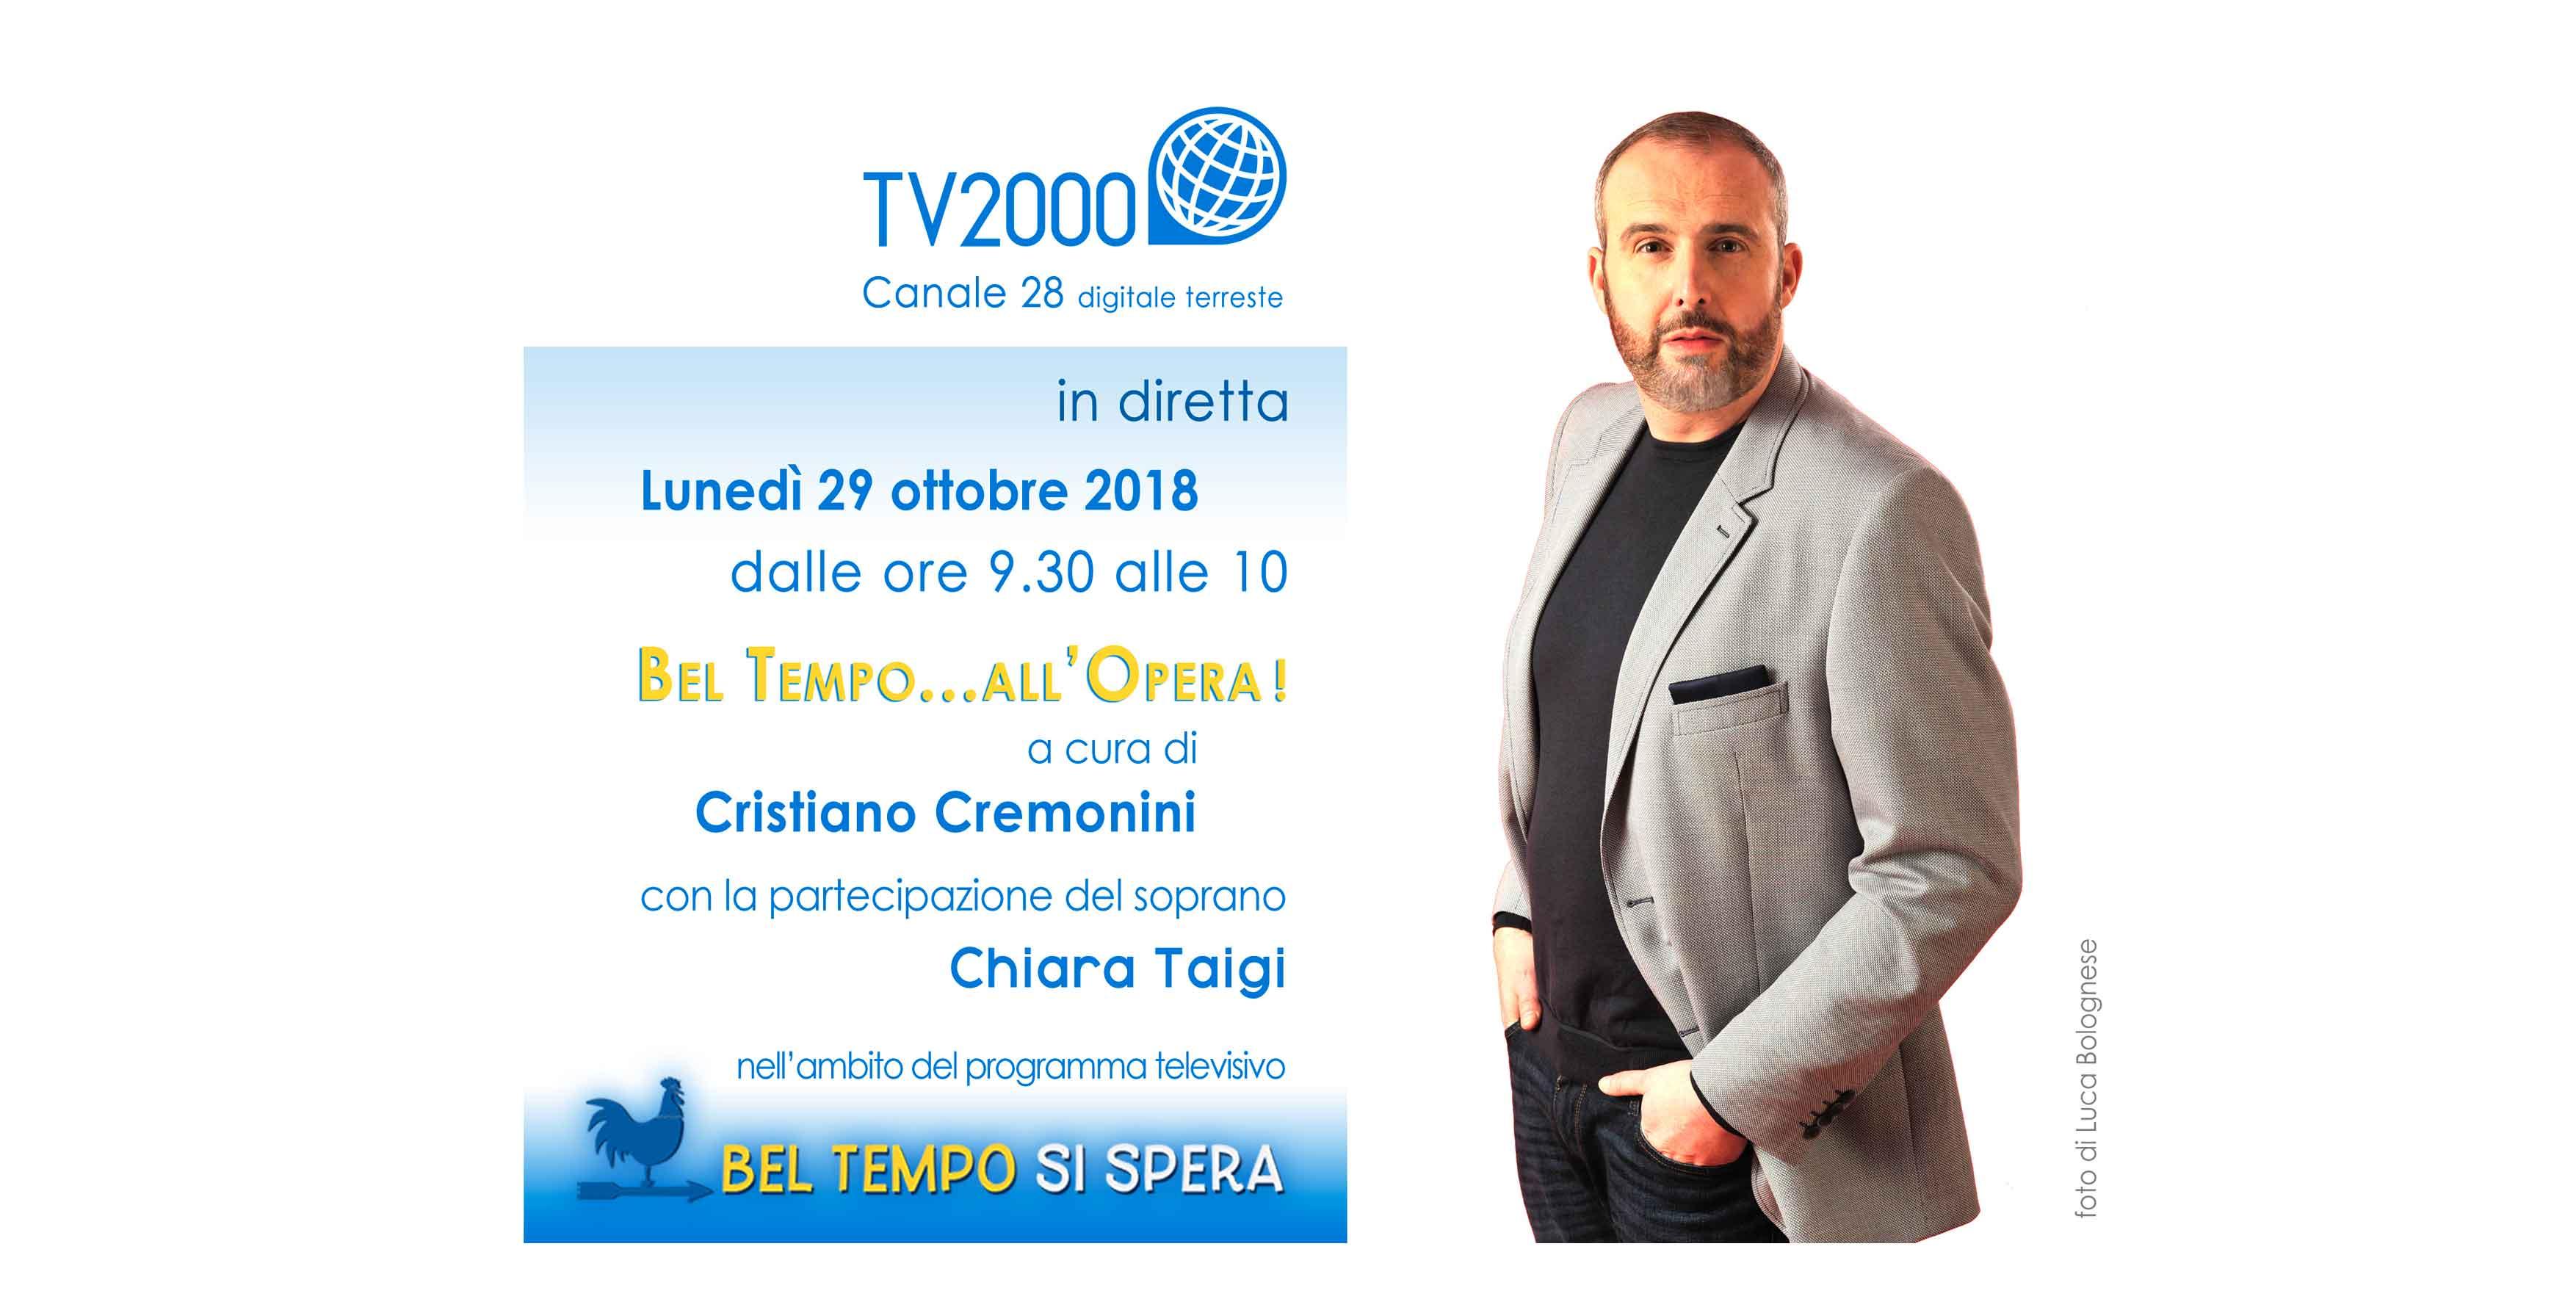 Cremonini_TV2000_2018_slide